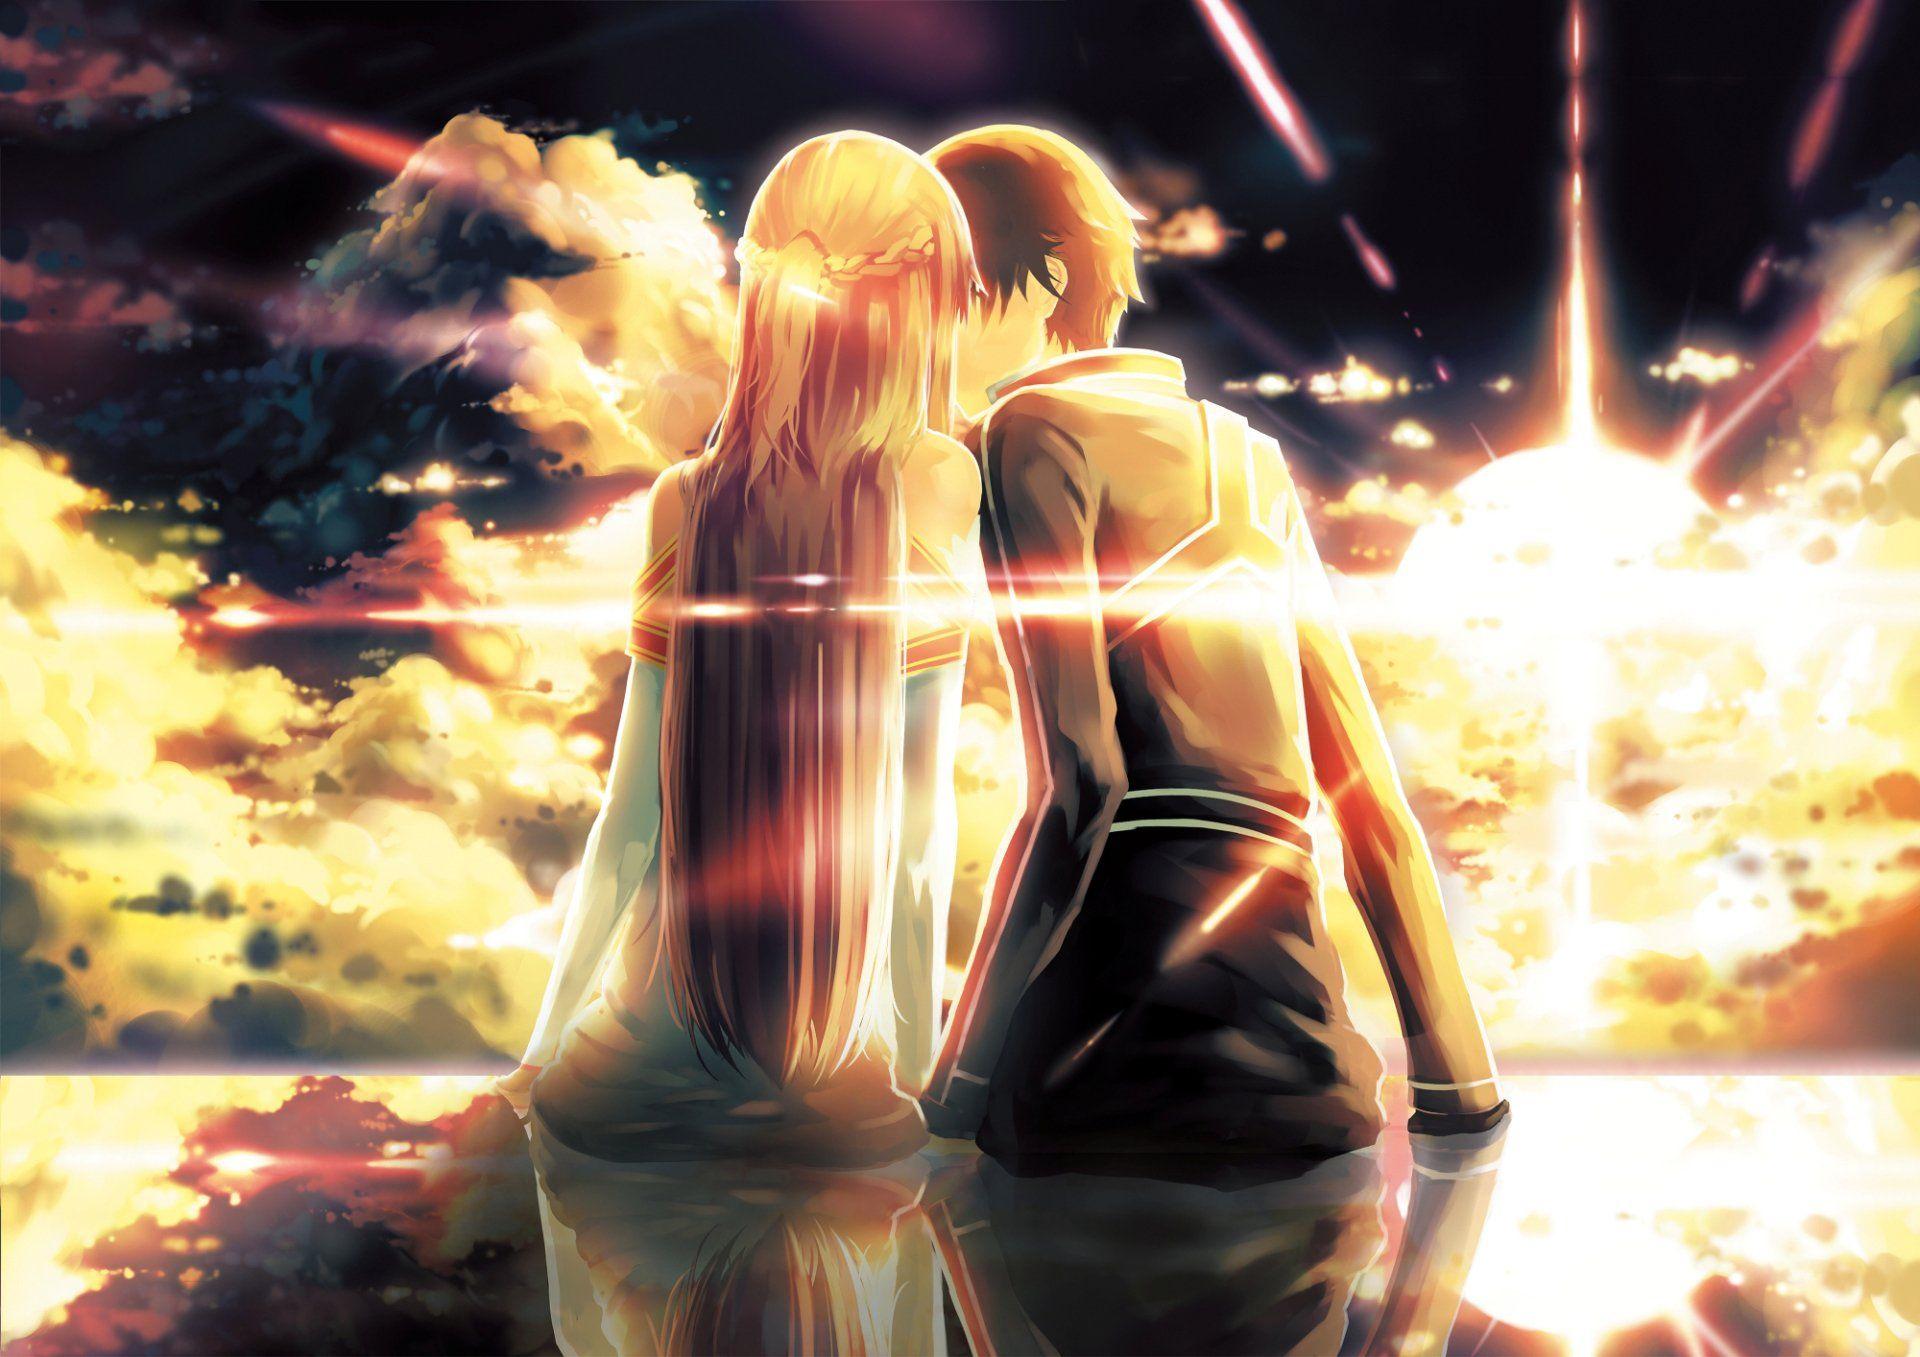 Anime Sword Art Online Kirito Asuna Yuuki Wallpaper